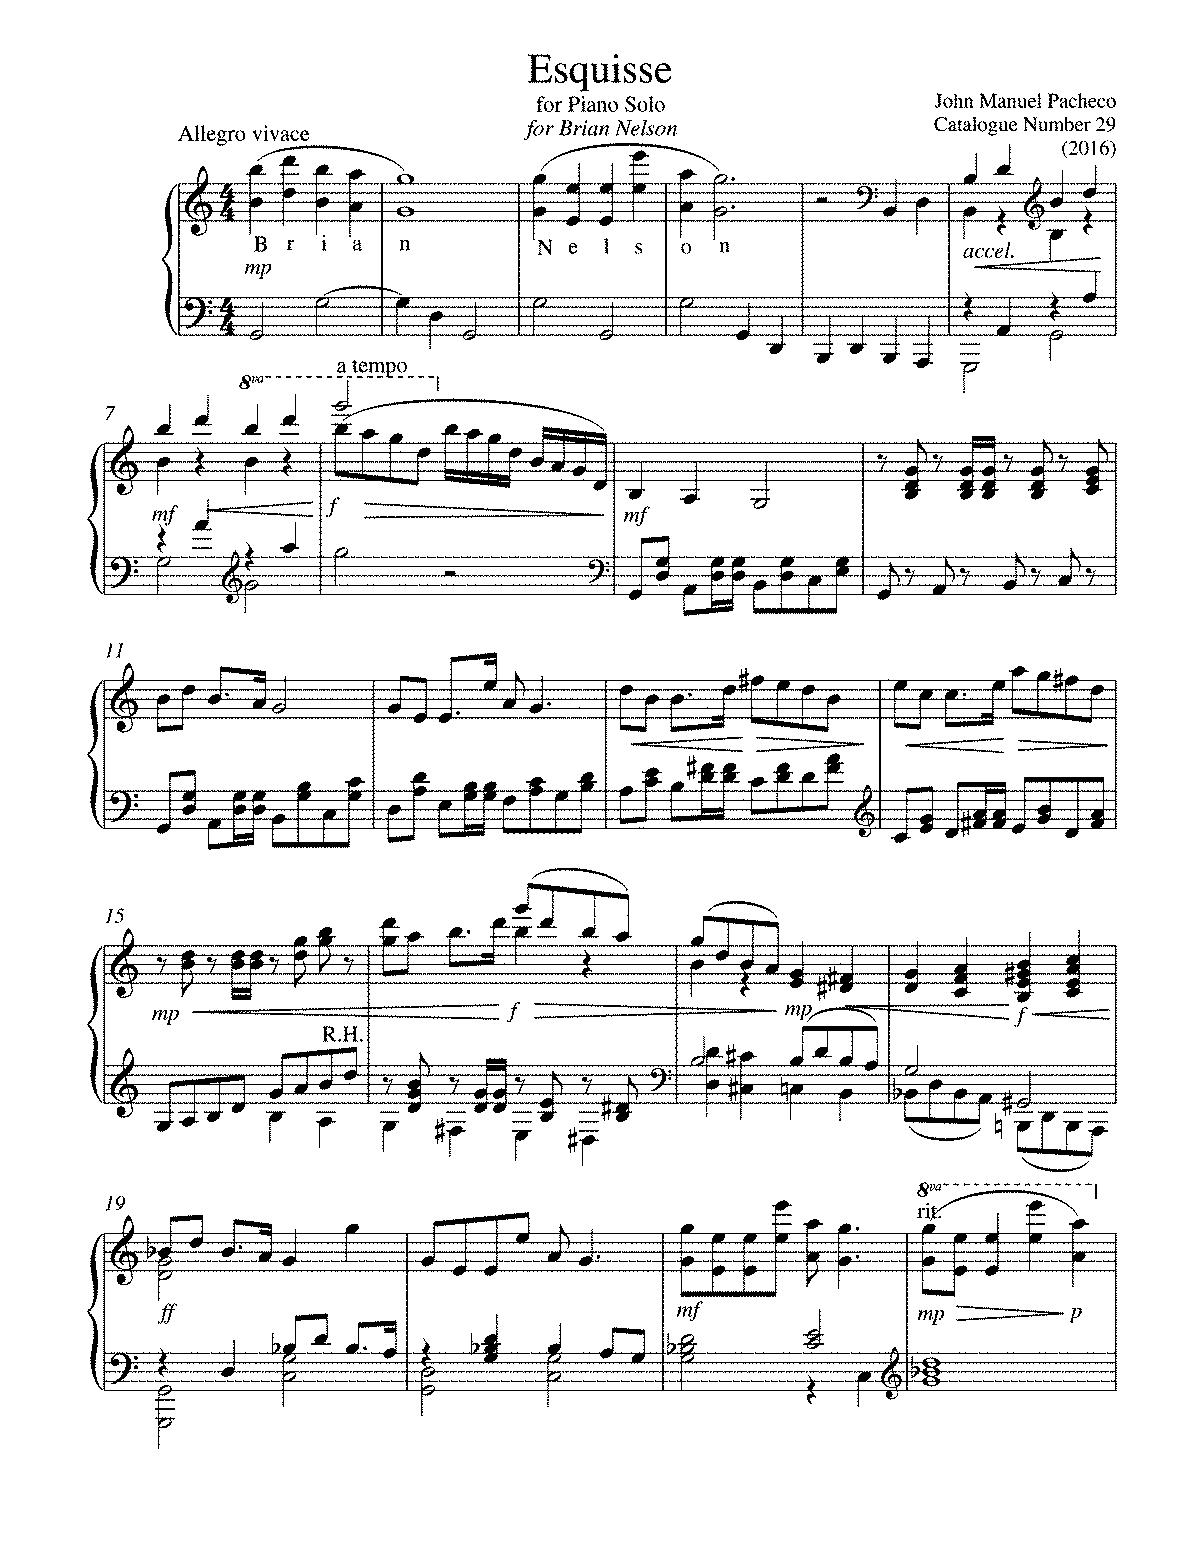 esquisse pacheco john manuel petrucci music library general information